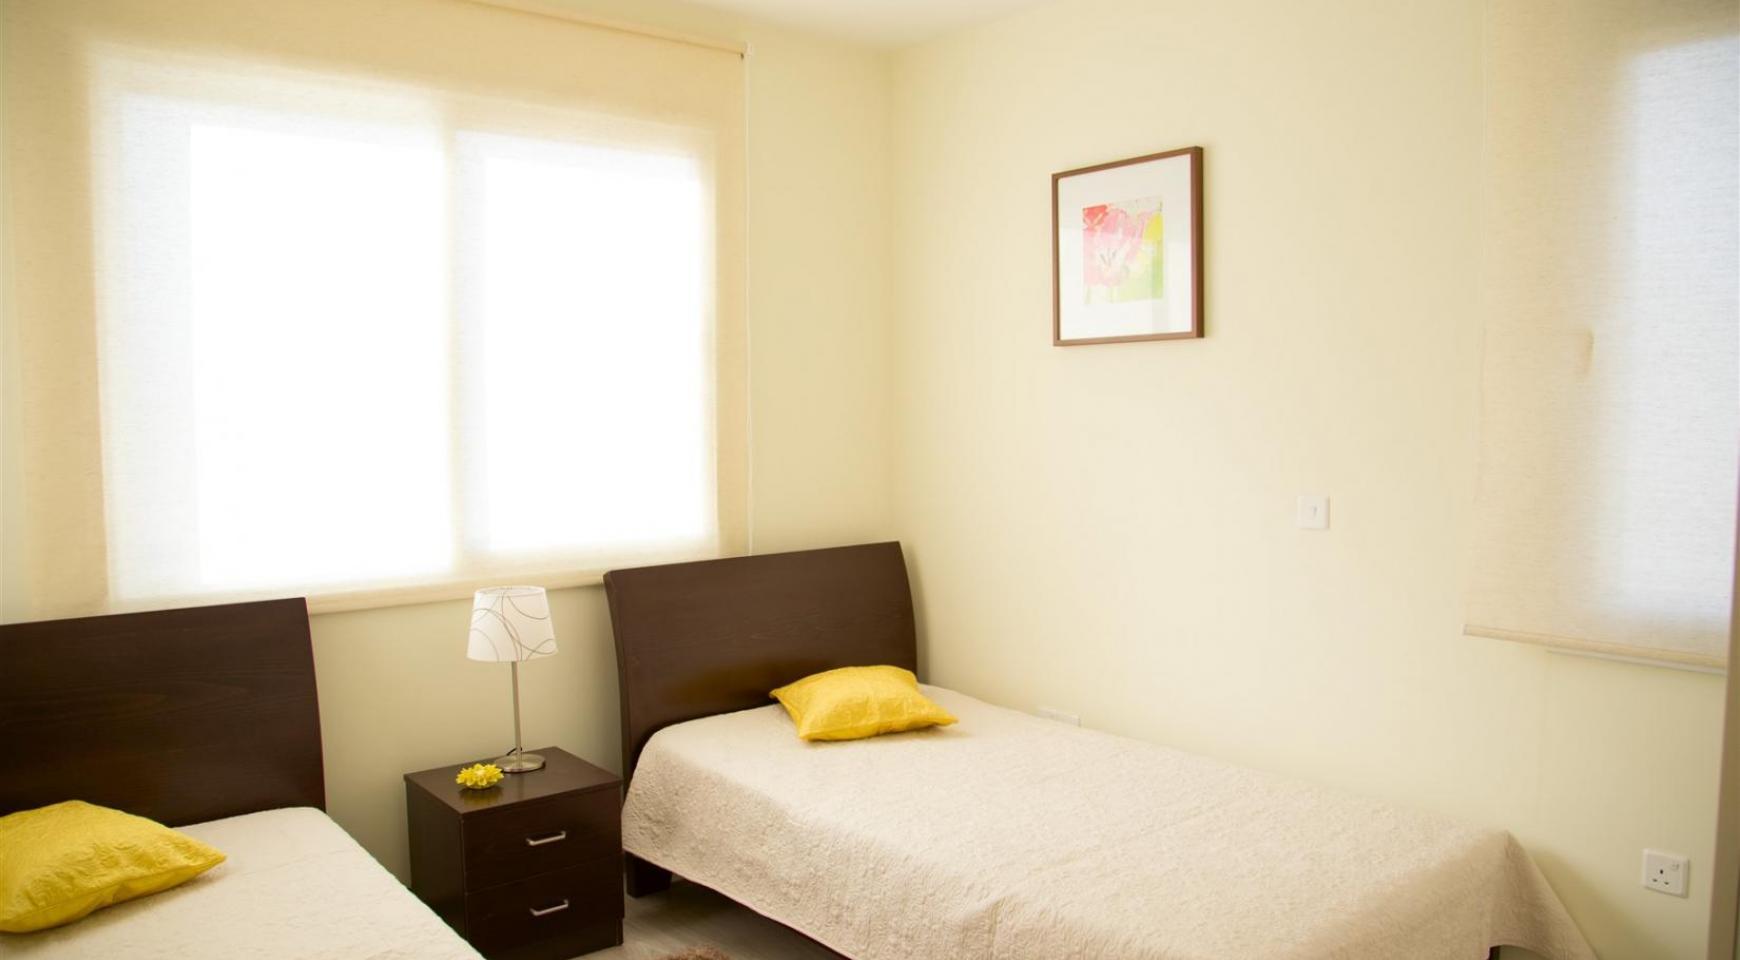 Luxury 2 Bedroom Apartment Christina 301 in the Tourist Area - 33